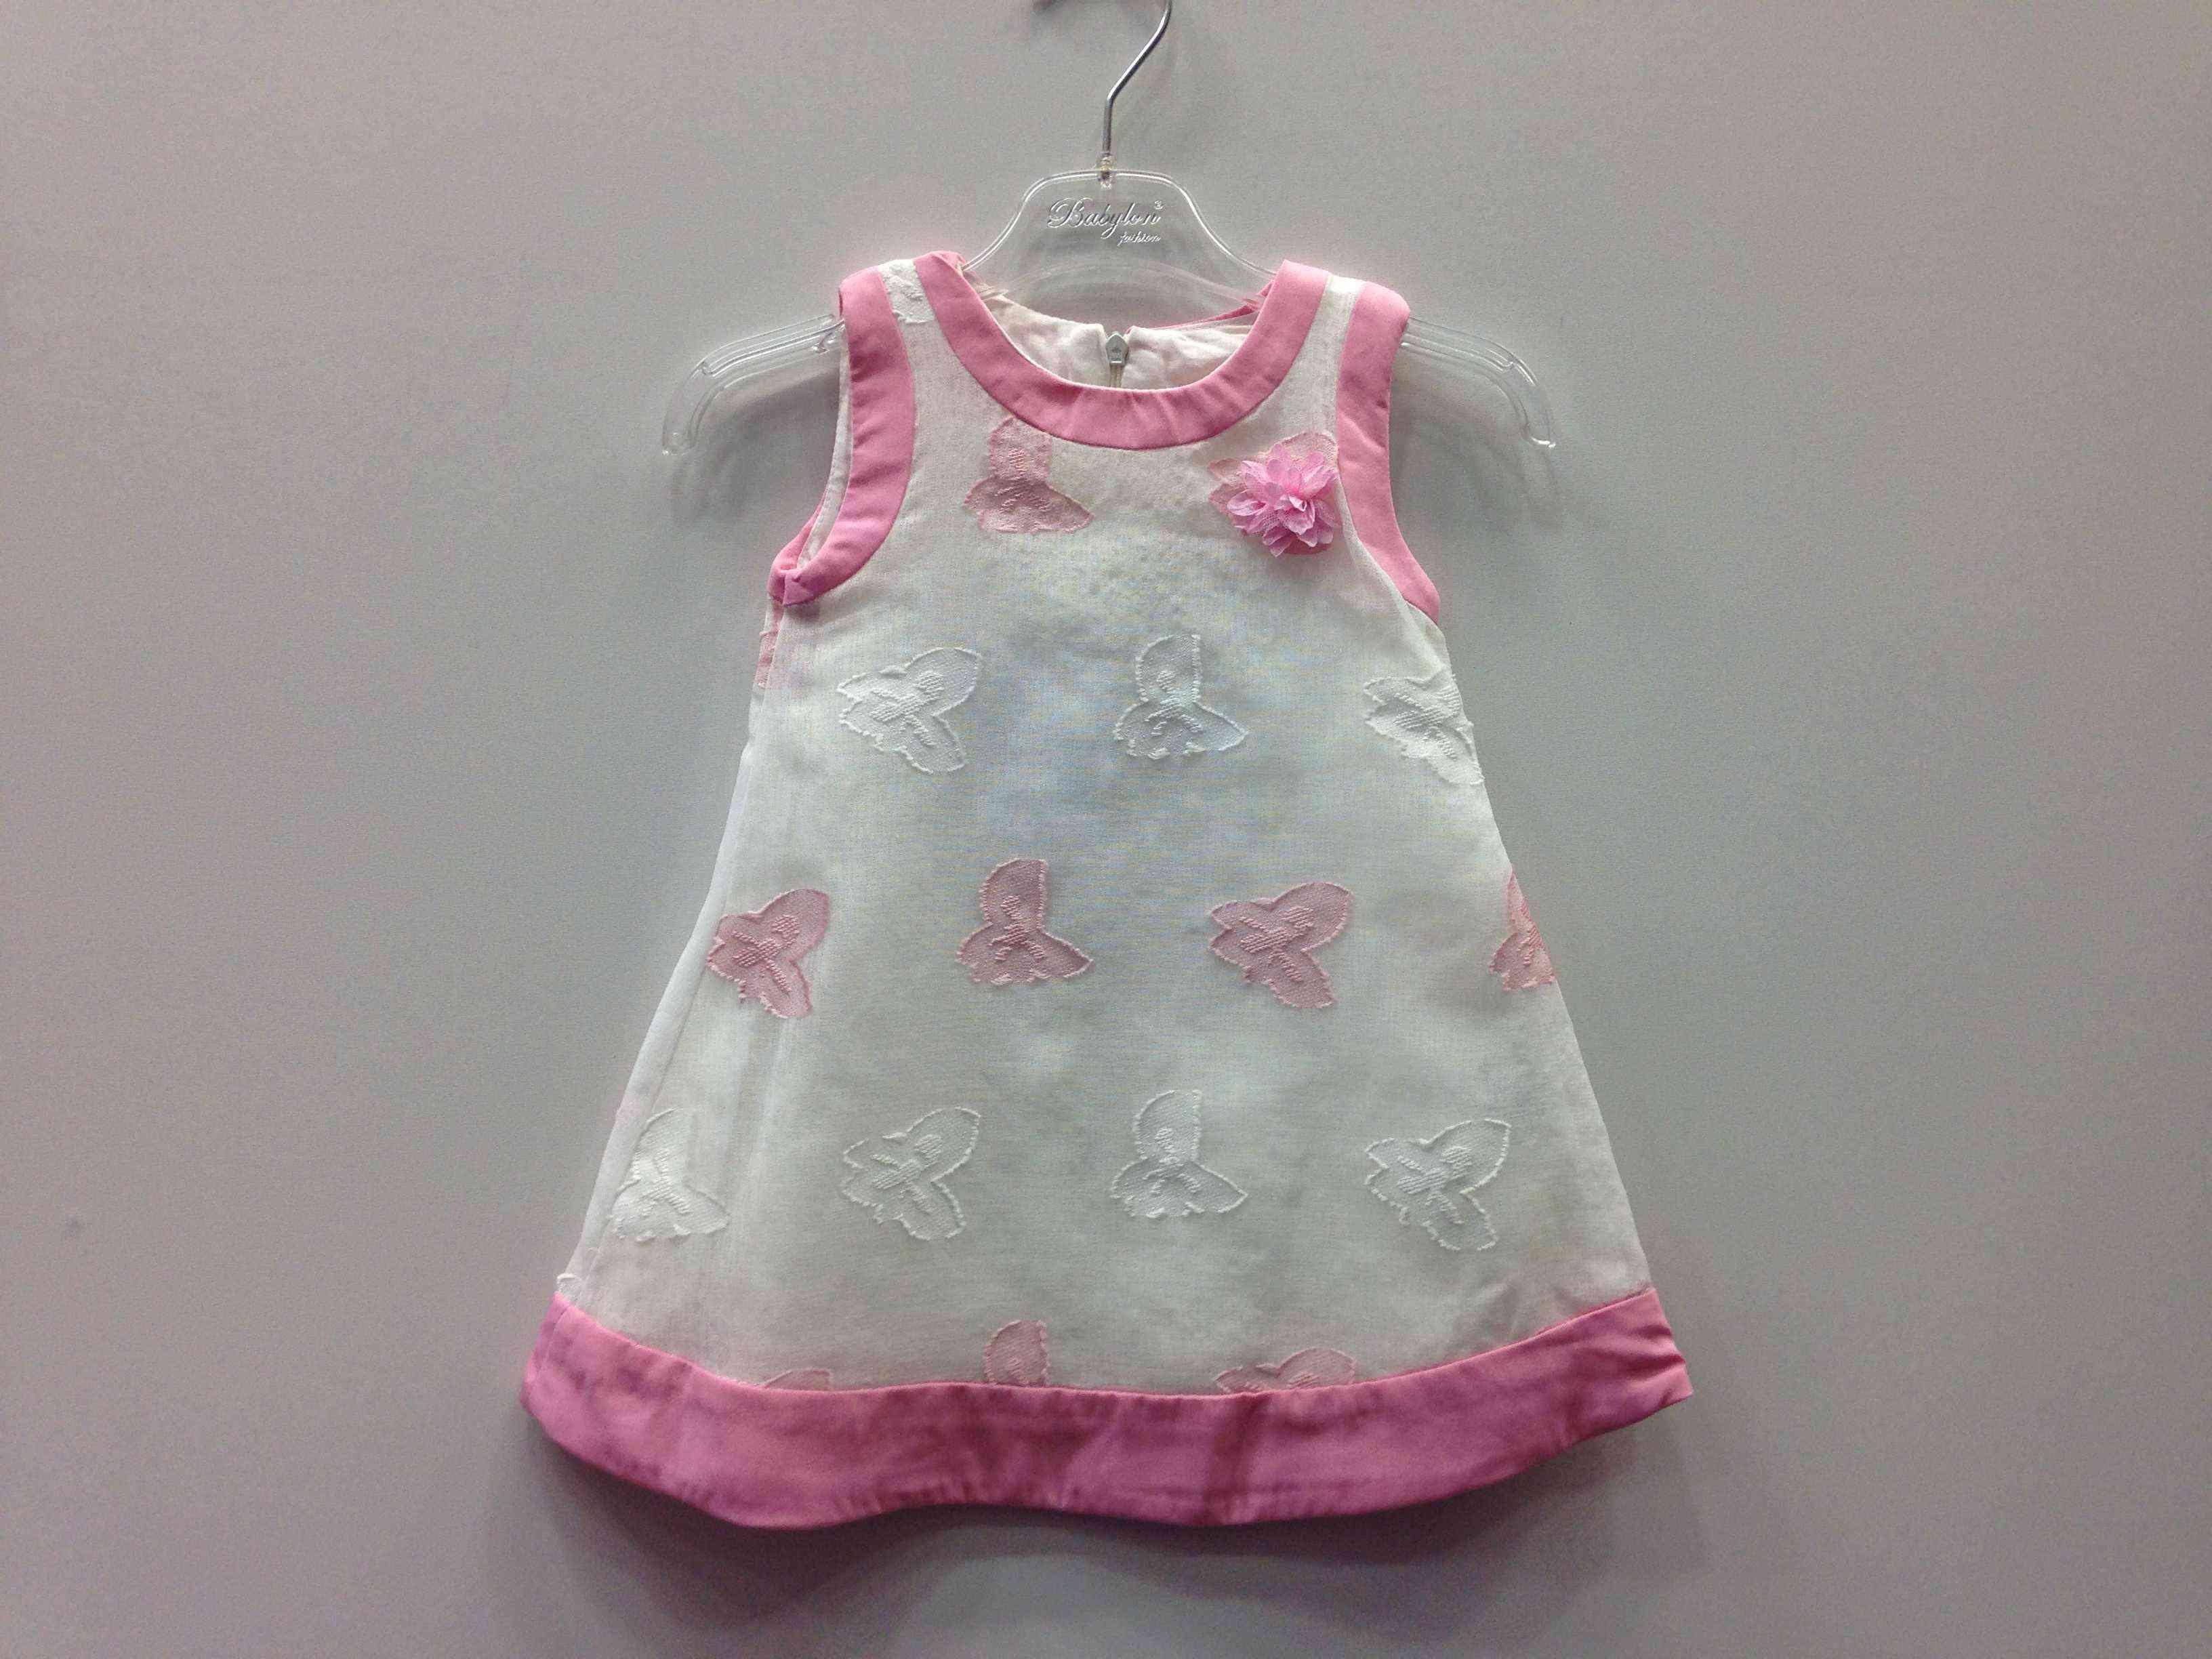 fbdd32bf186 BABYLON φόρεμα με κεντητές πεταλούδες α/μ -